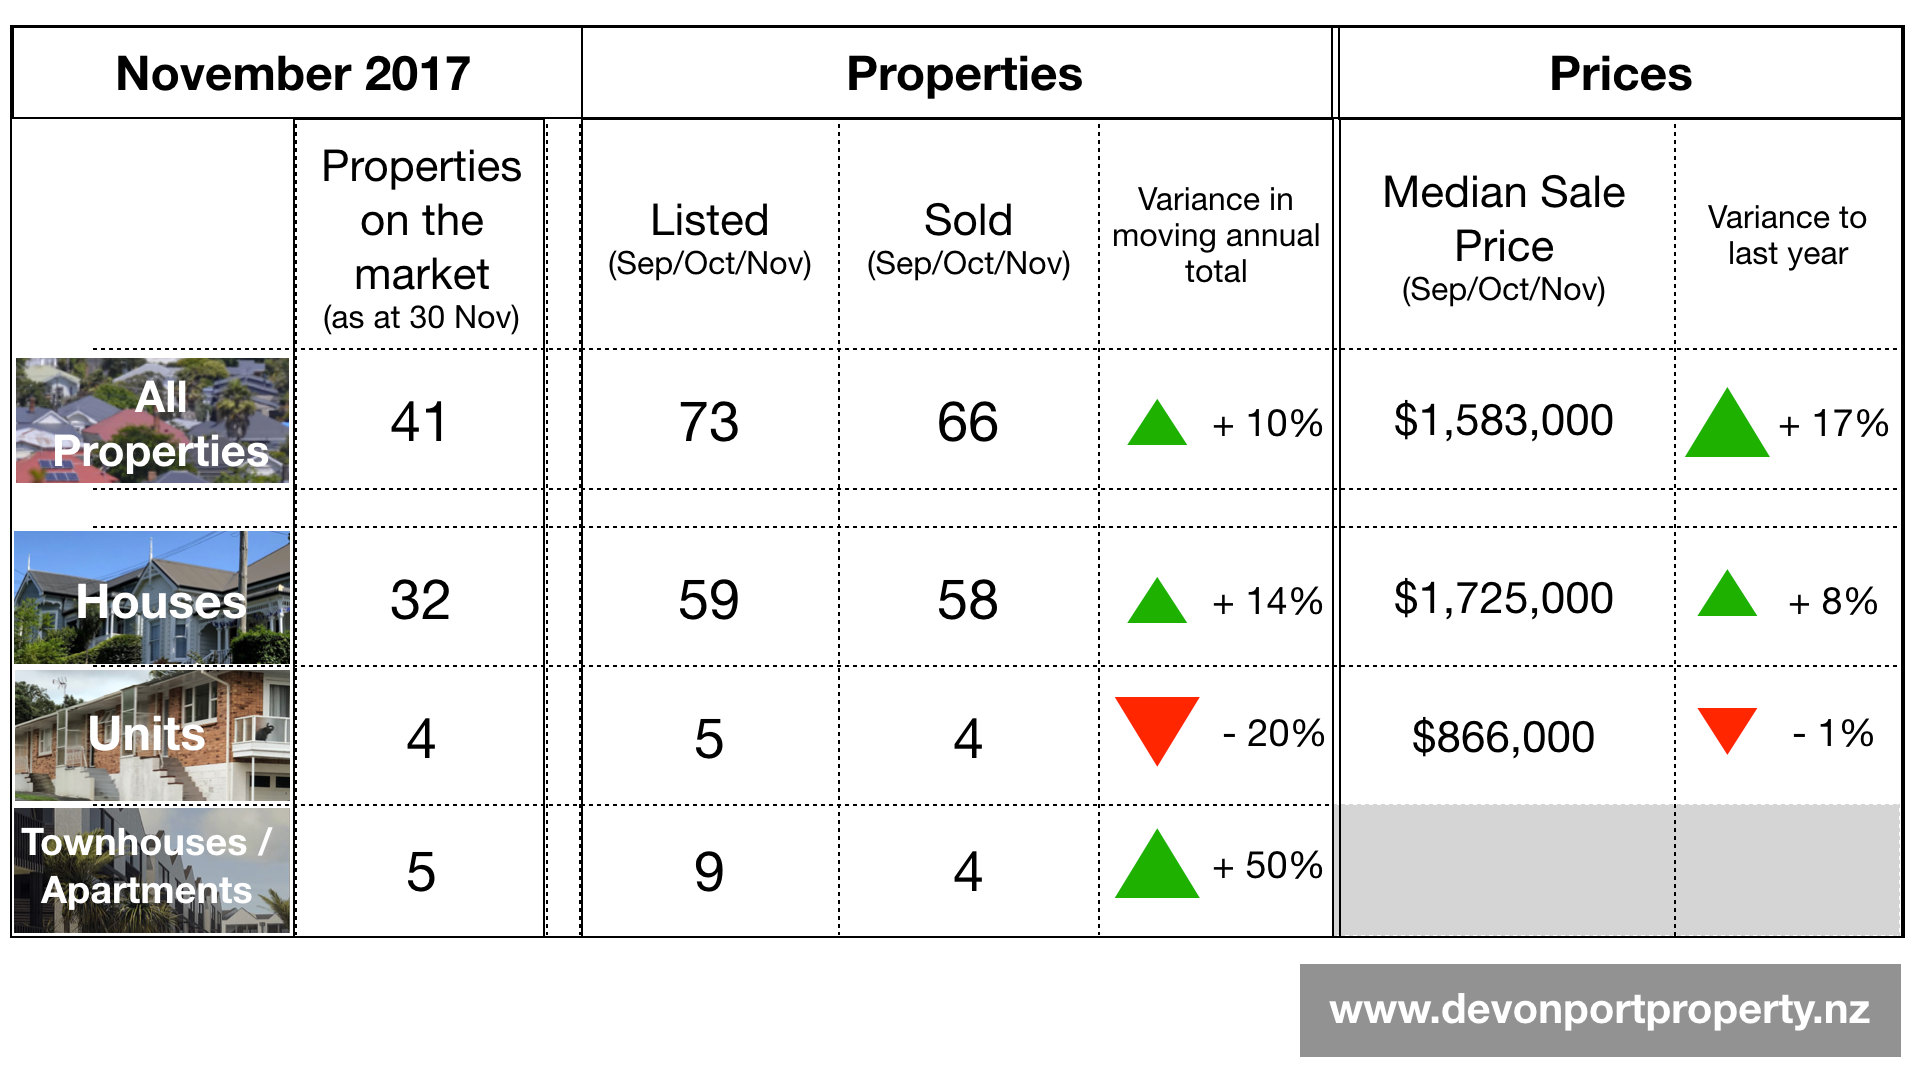 Devonport property all property data Table Nov 17.png